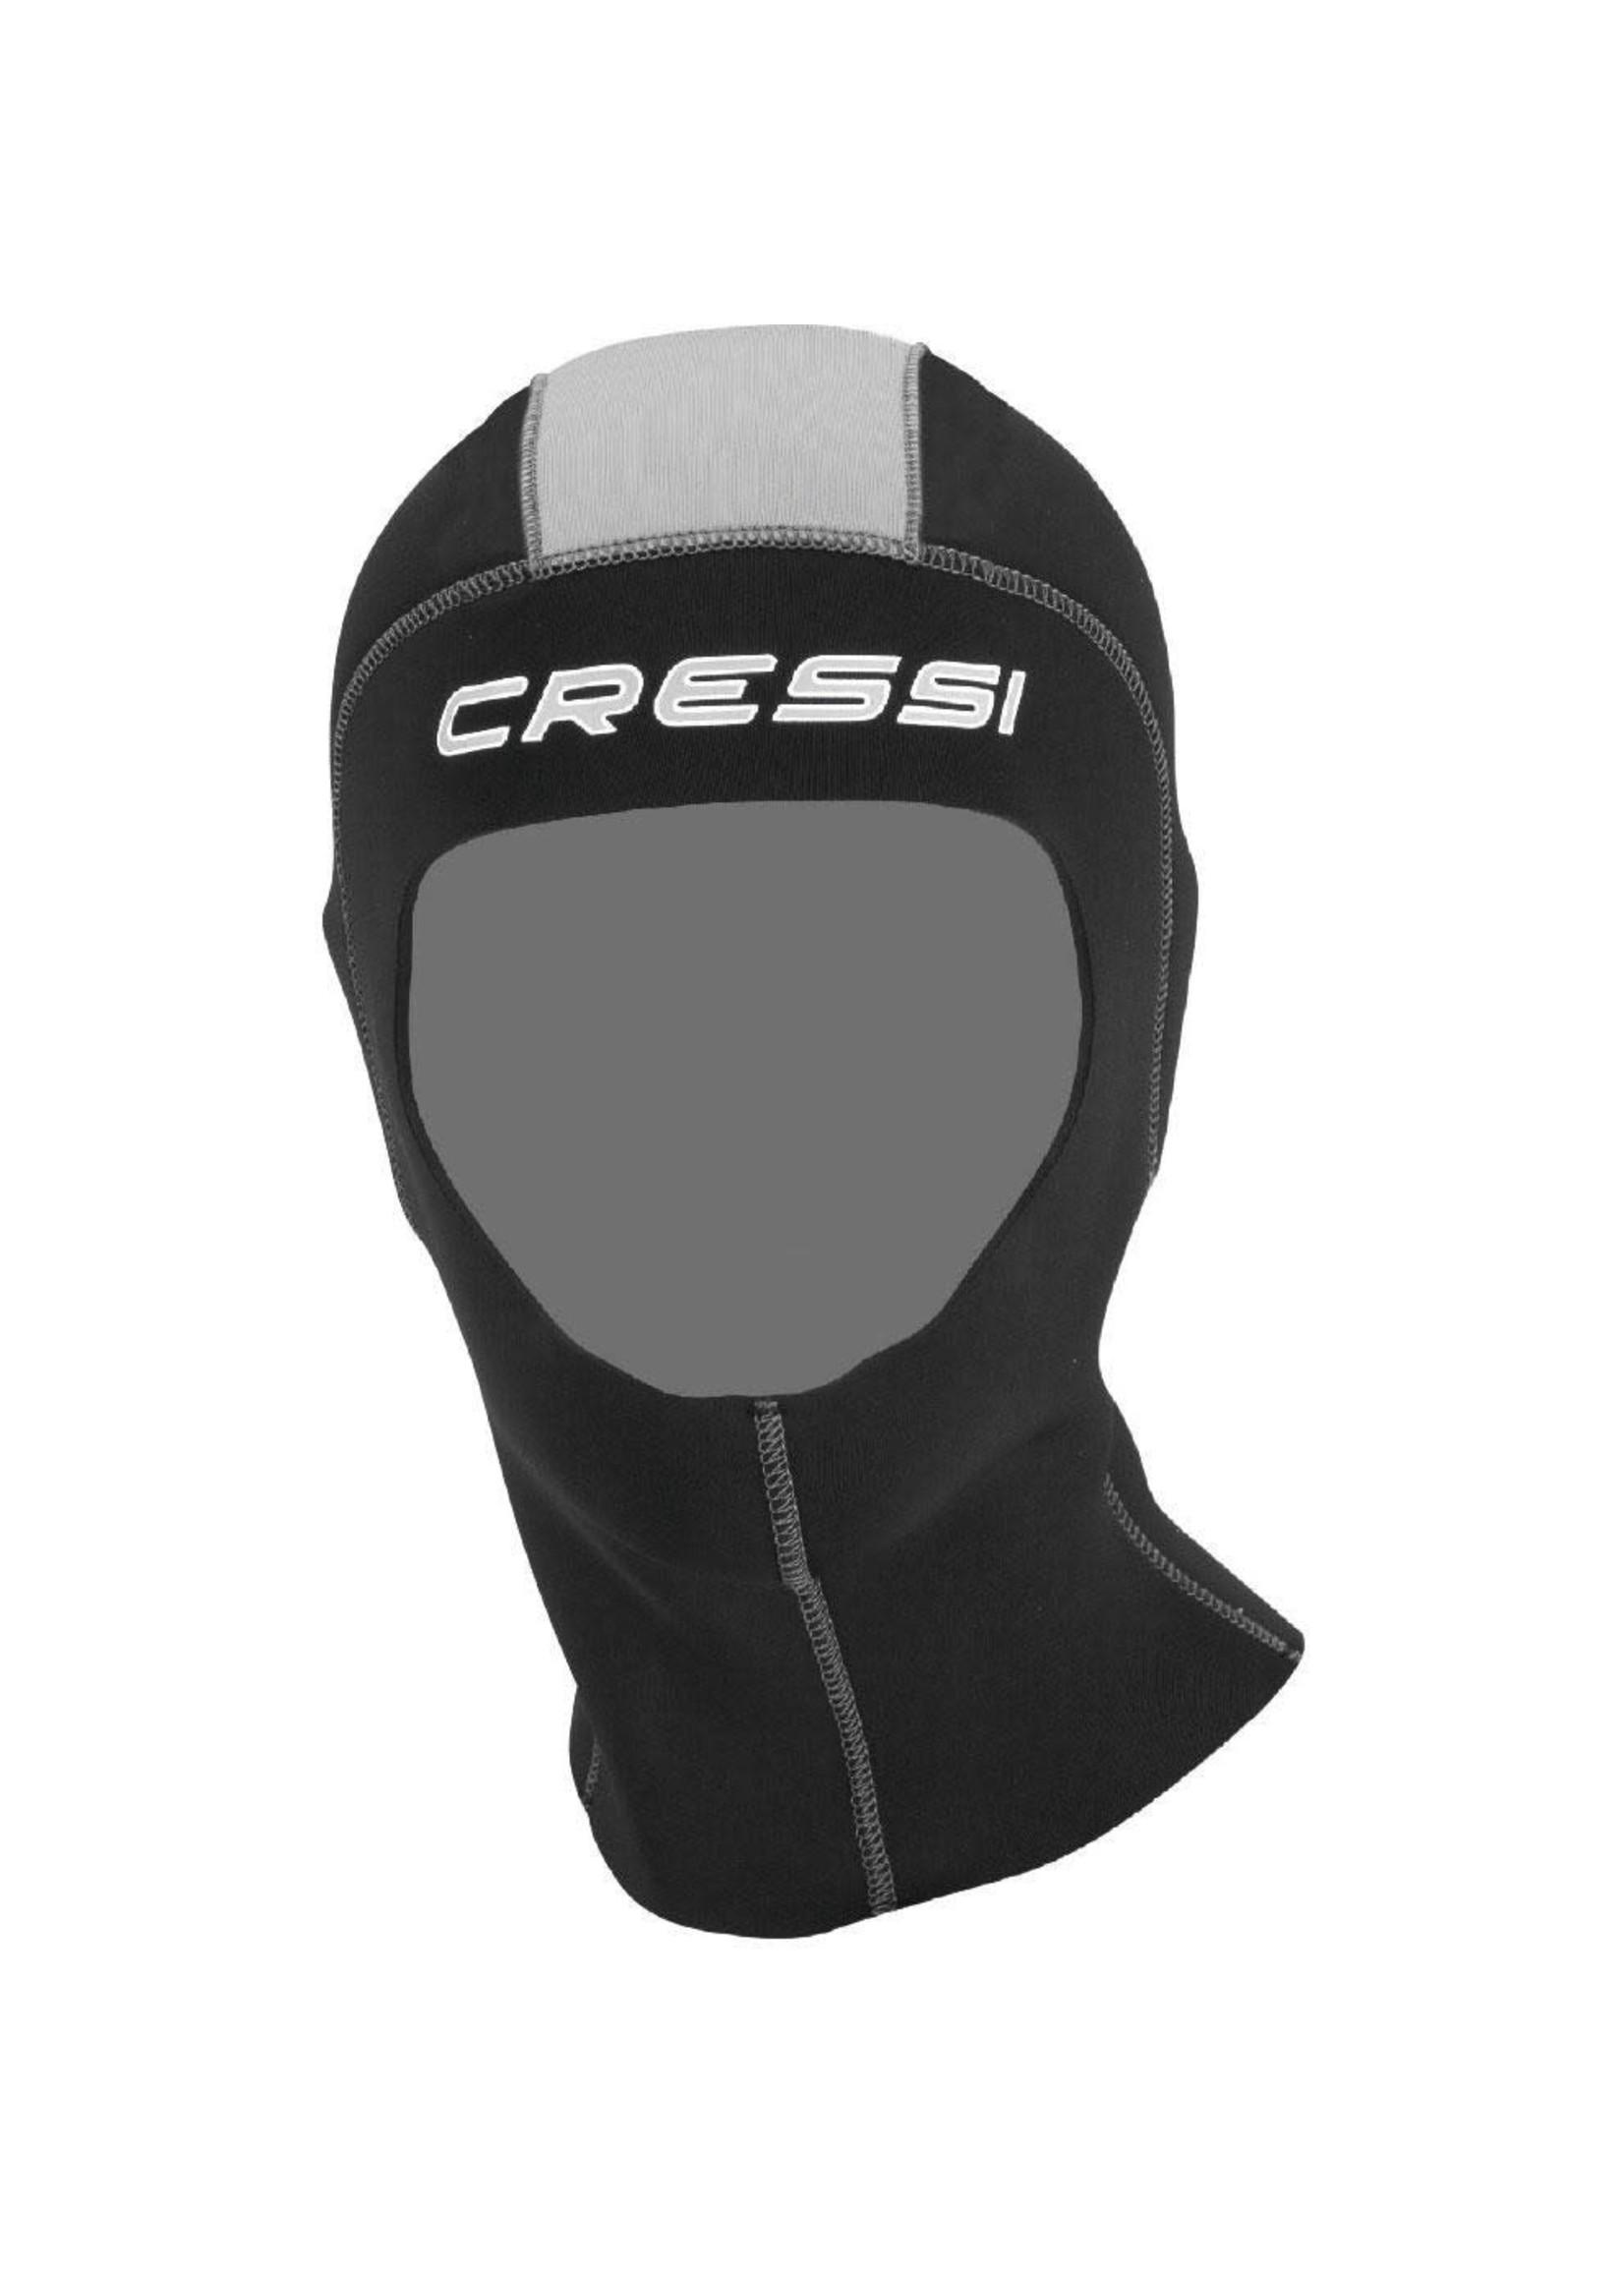 Cressi Cressi Atelier Comfort All-in-One 5mm - vrouw